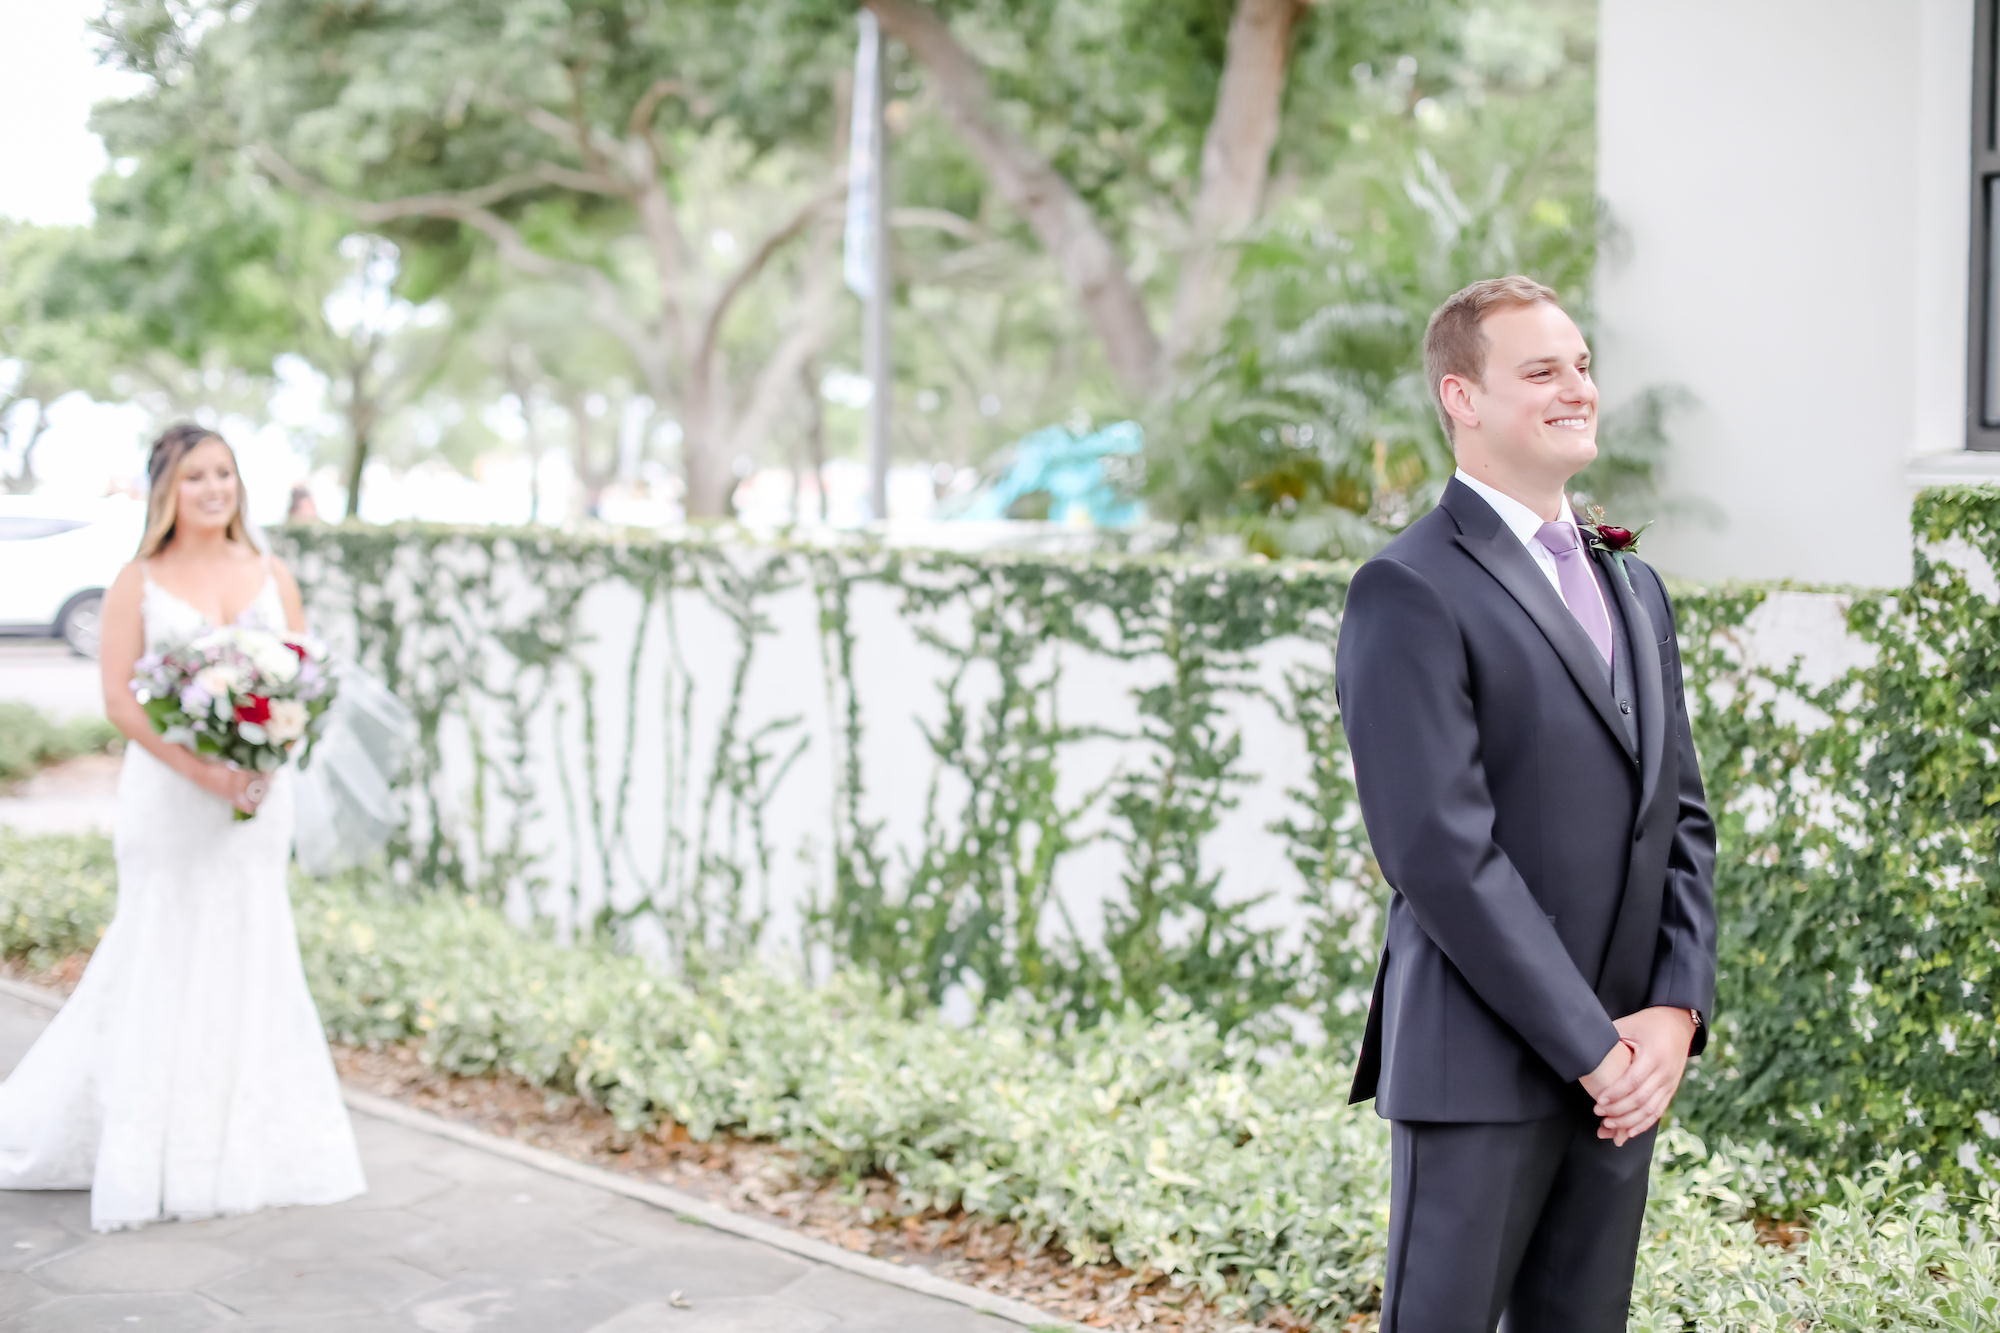 Downtown St. Pete Bride and Groom First Look Portrait, Groom in Mauve Tie   Florida Wedding Photographer Lifelong Photography Studio   Tampa Bay Wedding Venue The Birchwood